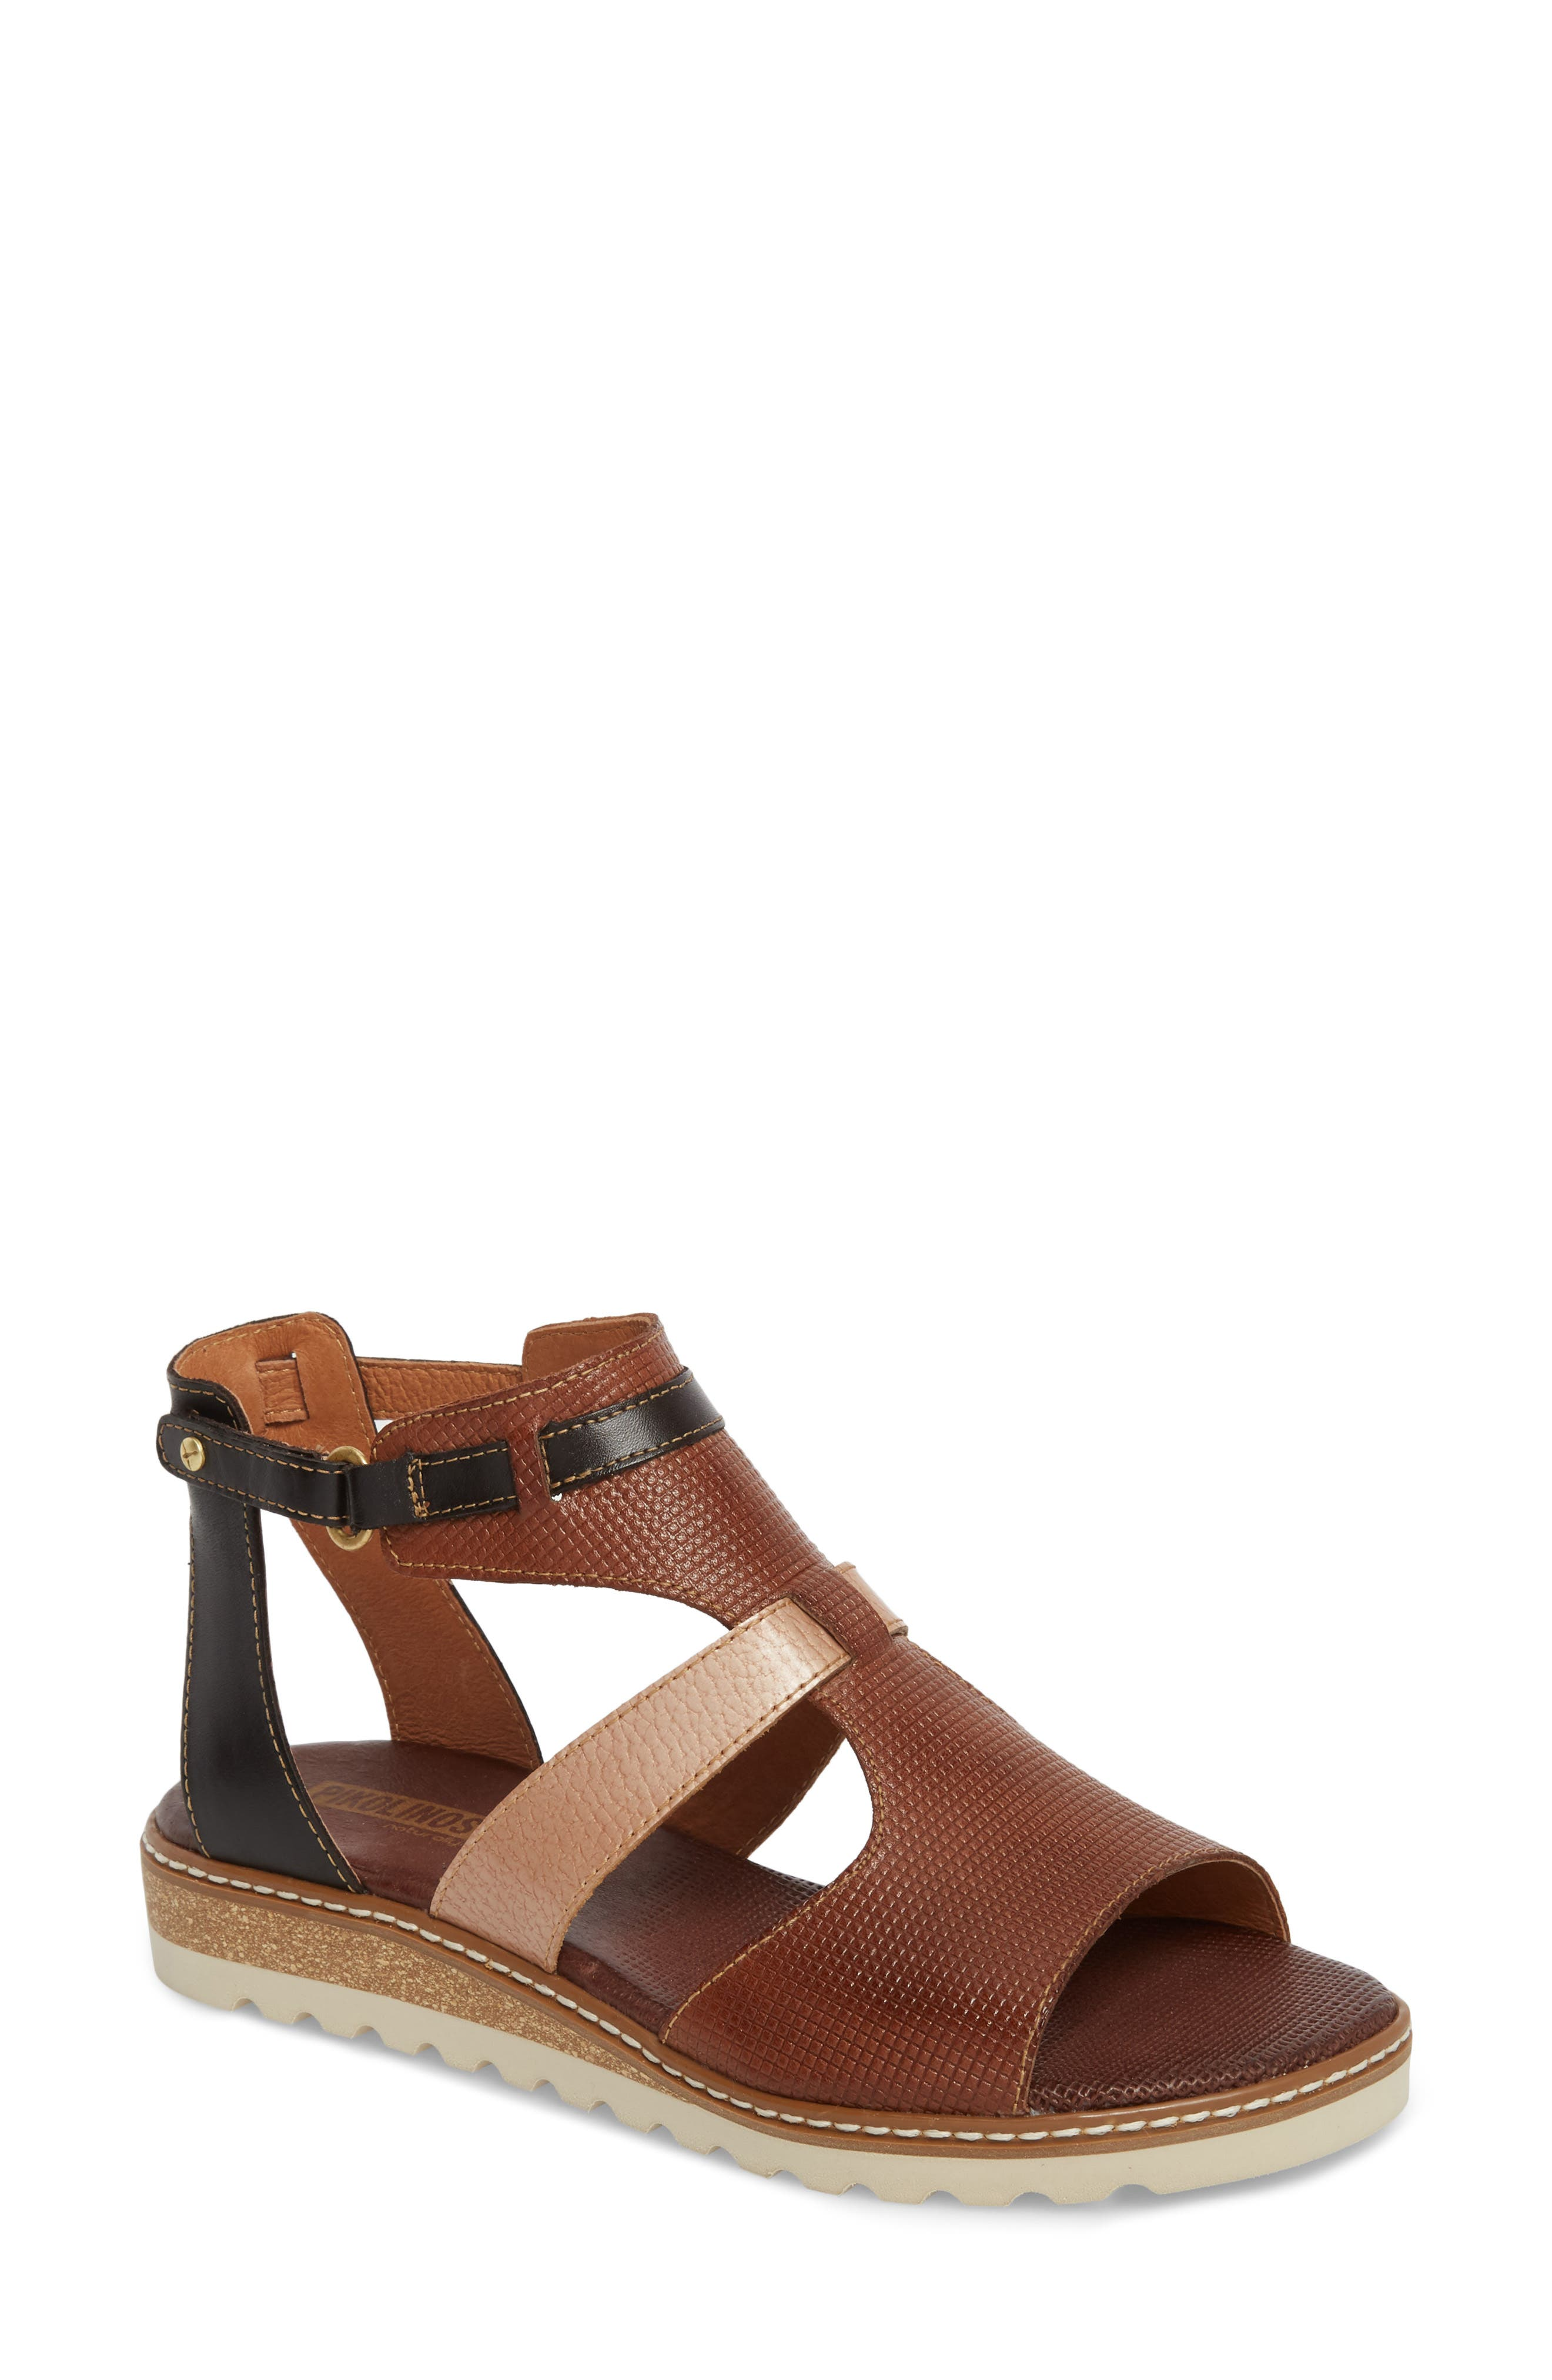 Alcudia Sandal,                         Main,                         color, Cuero Leather